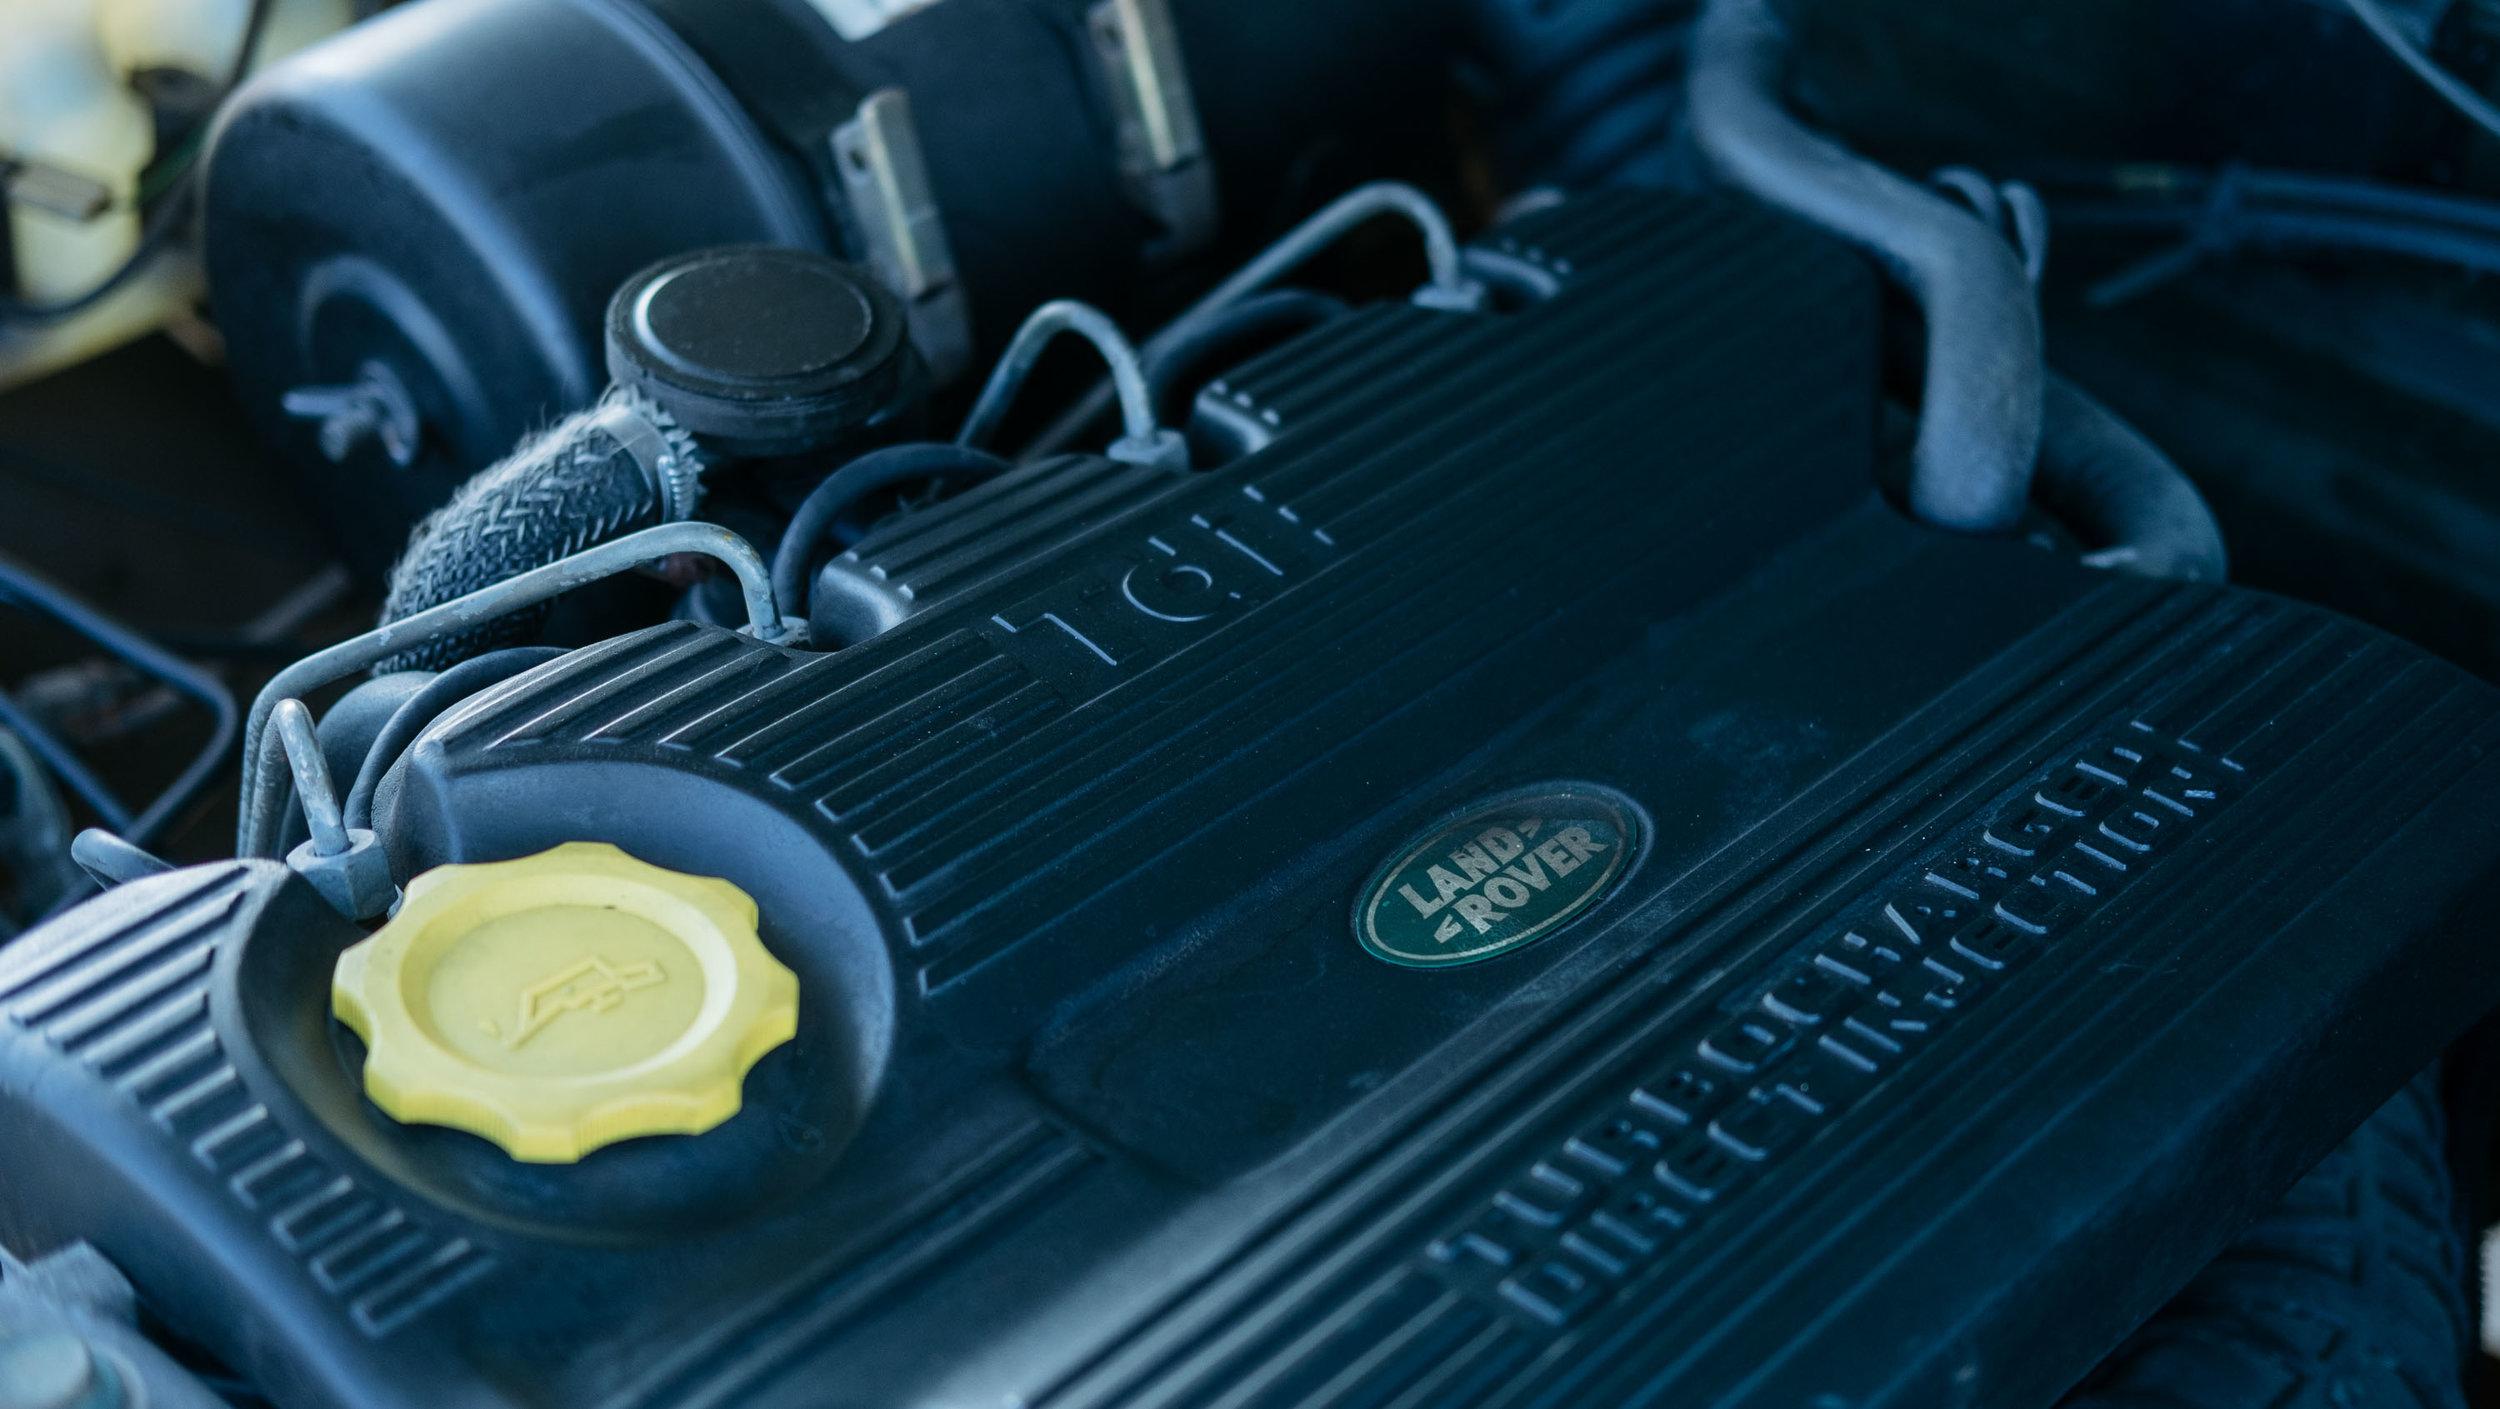 coolnvintage Land Rover Defender (35 of 98).jpg